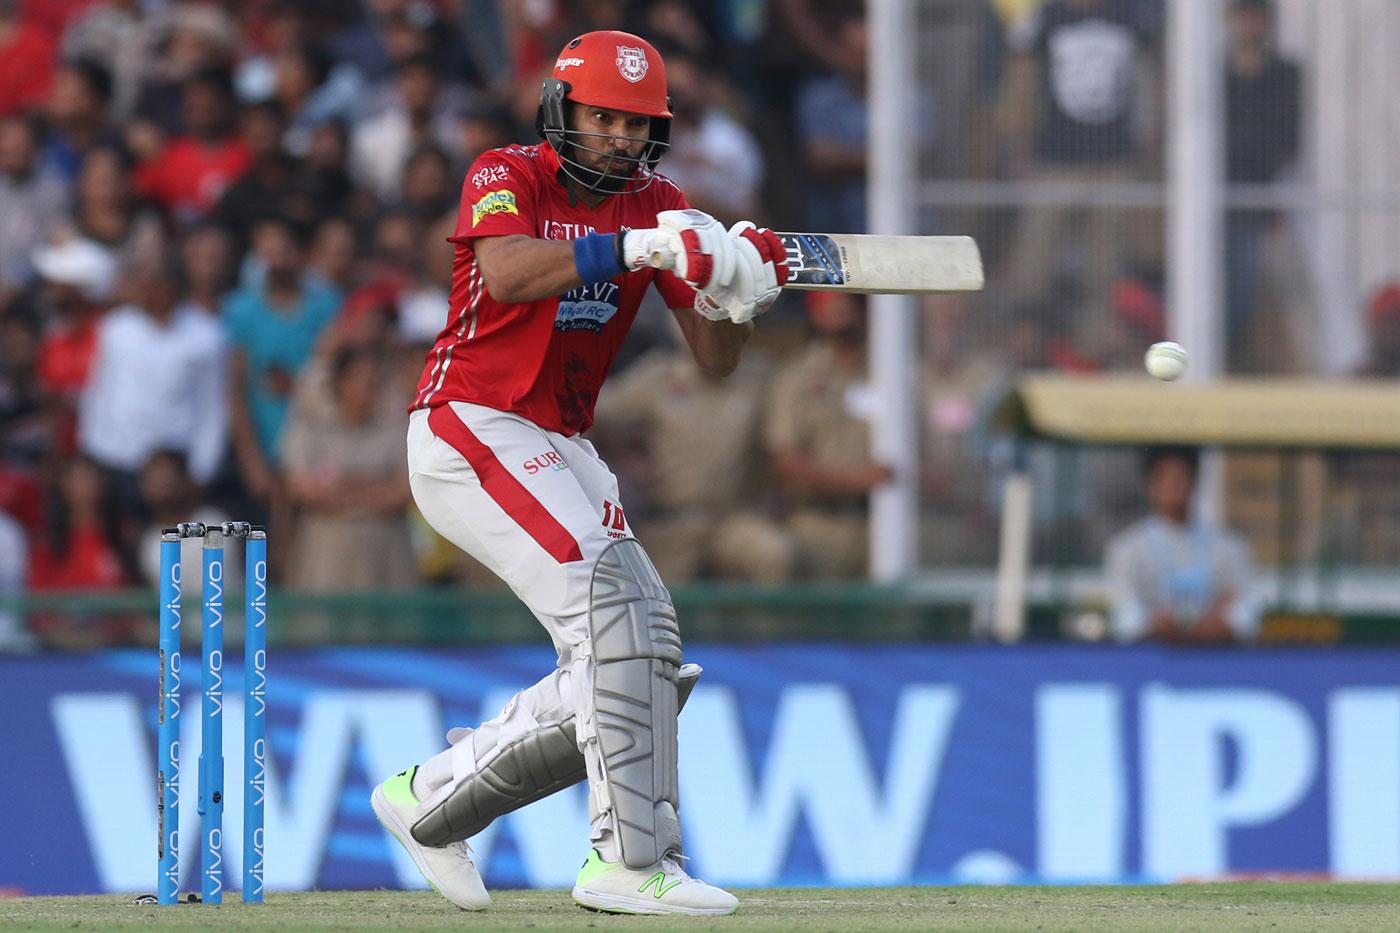 Yuvraj Singh plays a shot for KXIP In IPL 11. (Image: cricketaddictor.com)